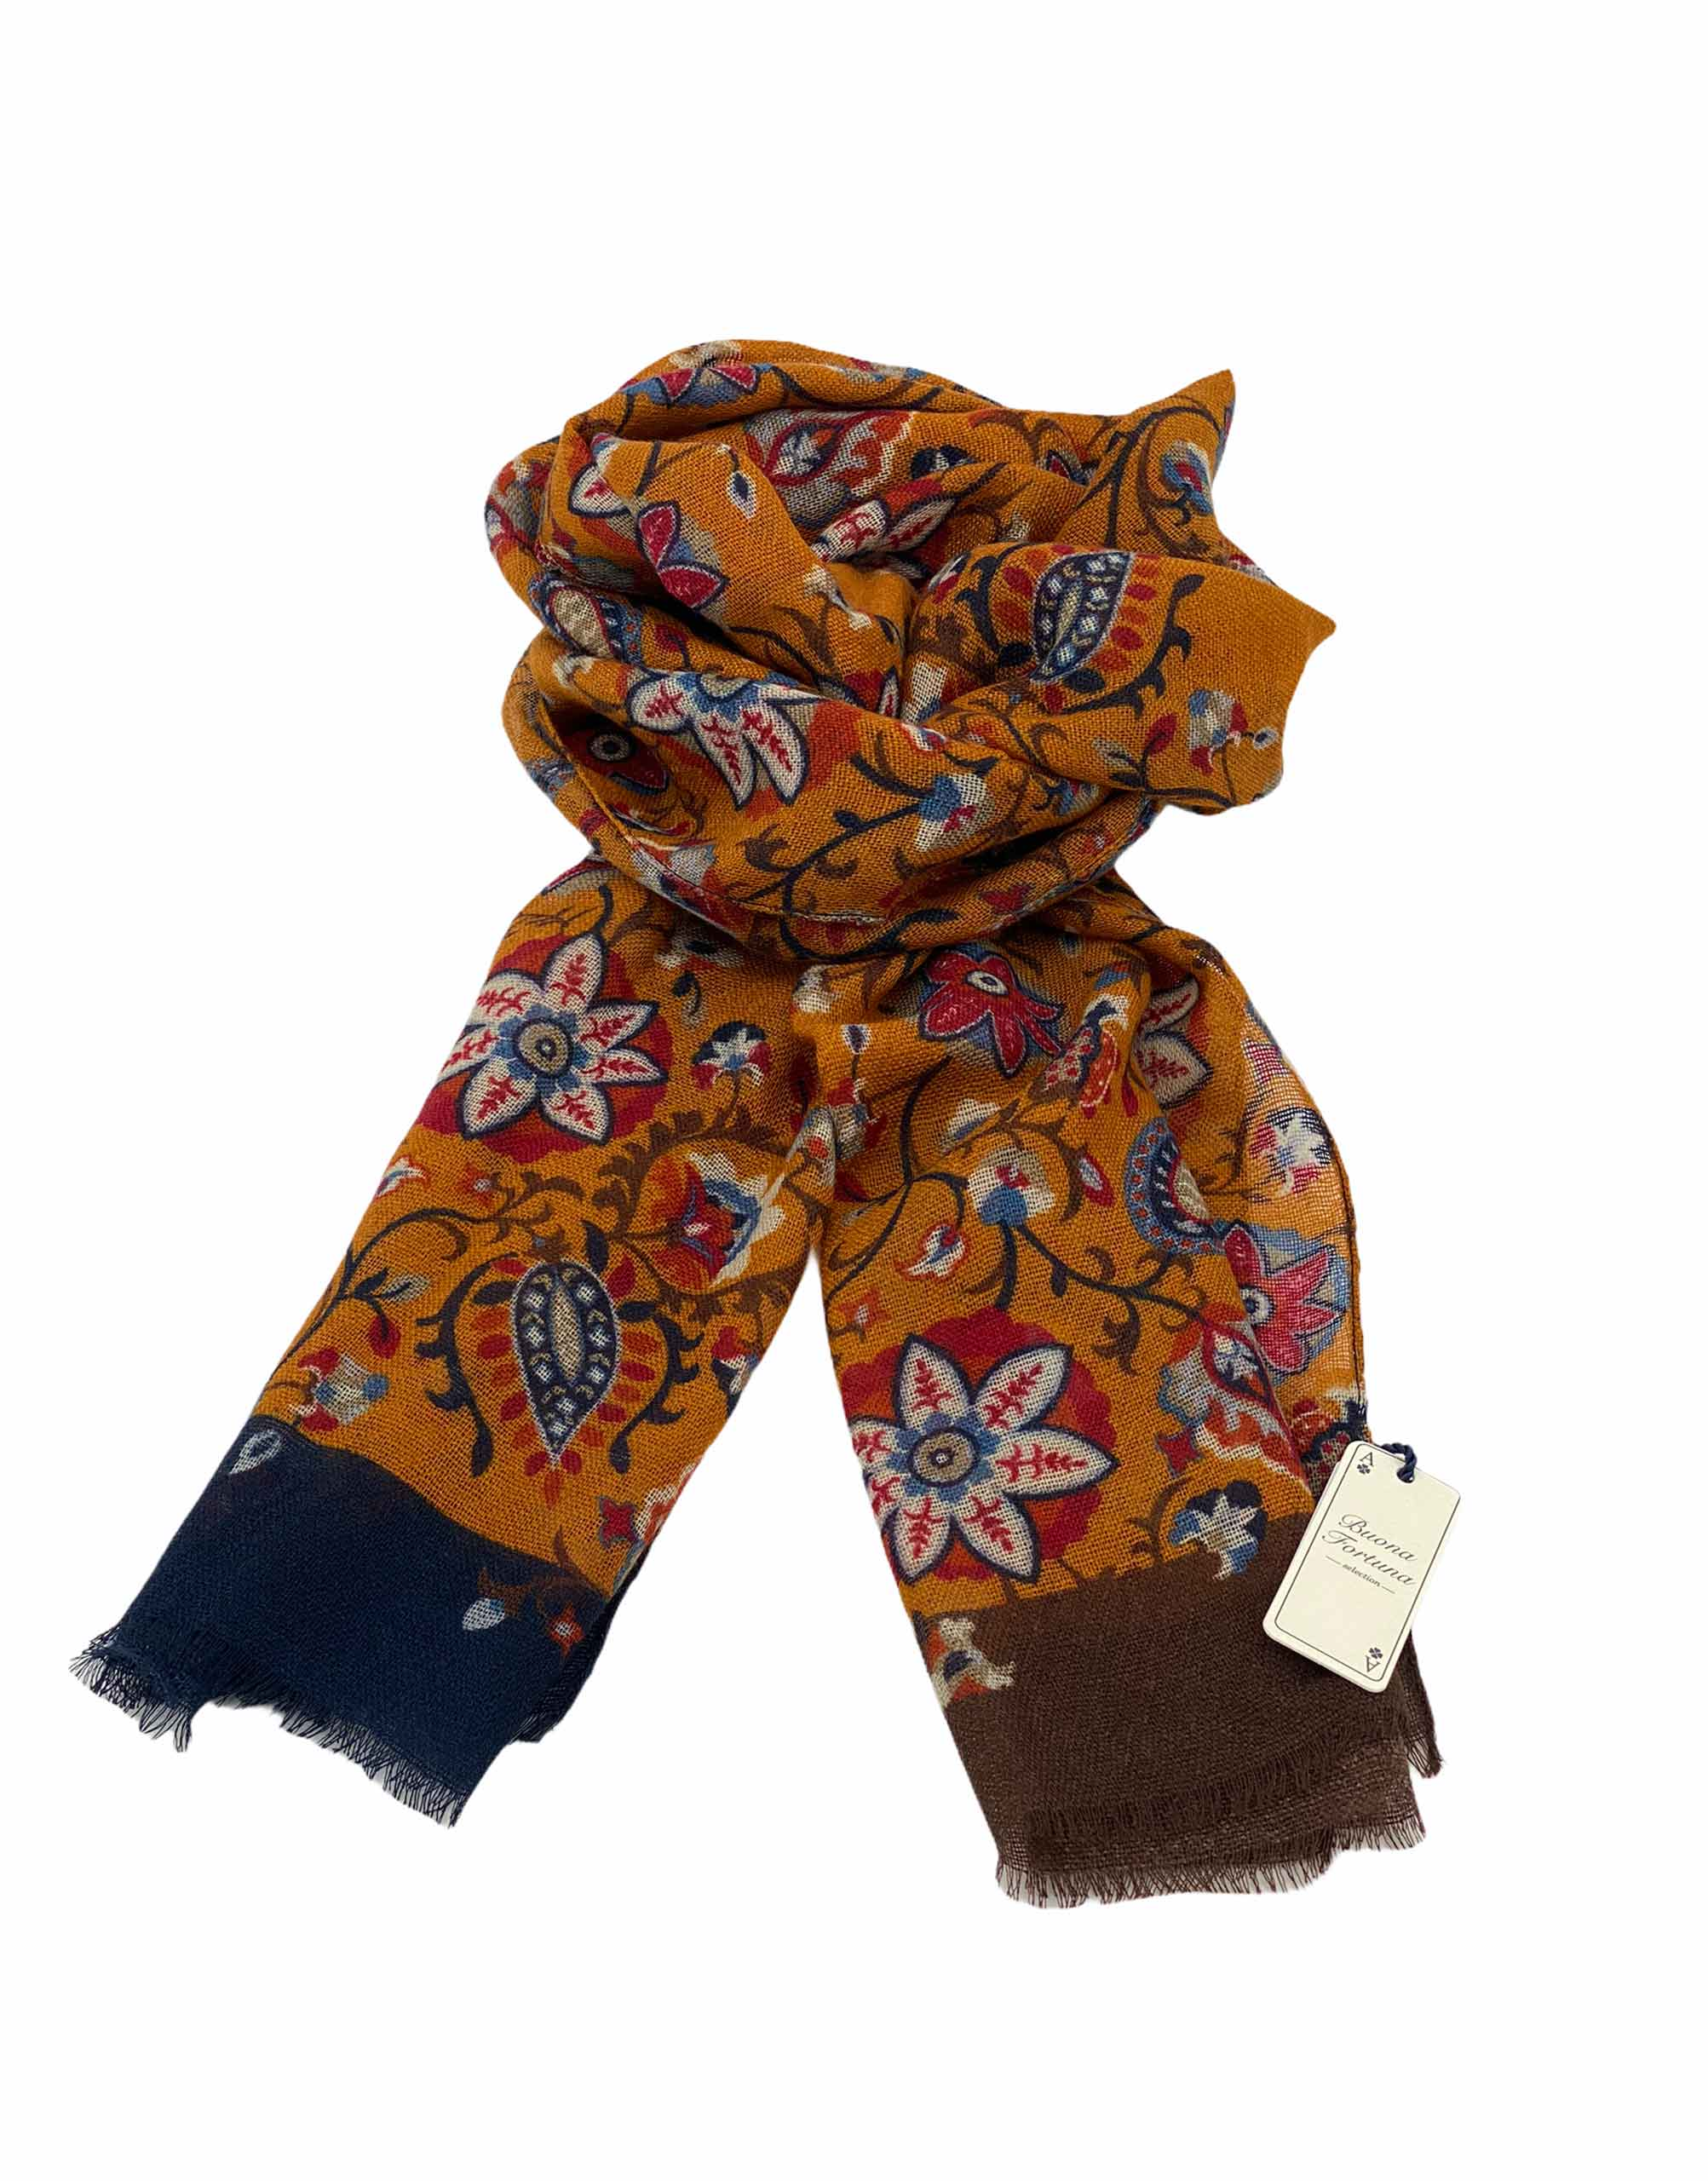 pashmina buona fortuna exclusivas comprar online moda italiana foulards shop naranja marino cashmere ocres